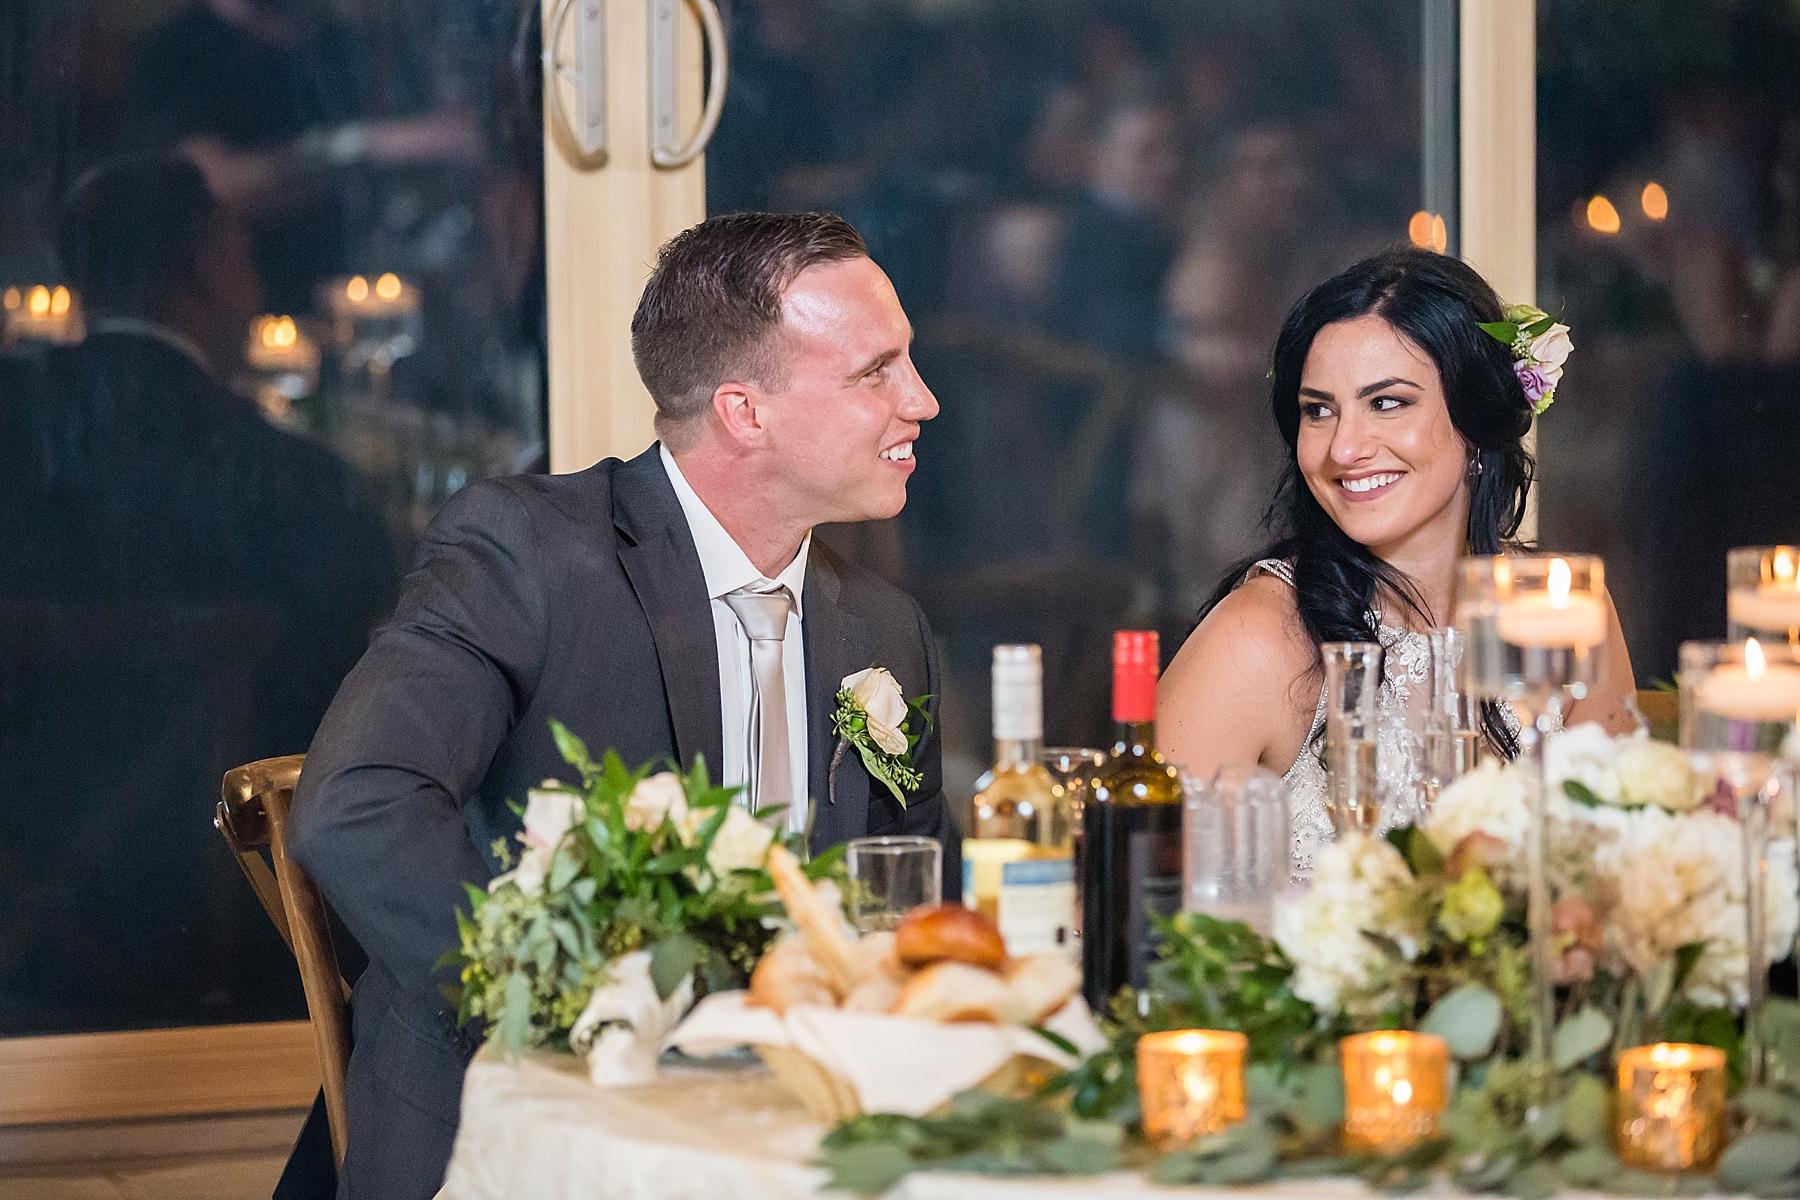 windsor-wedding-photographer-sprucewood-shores-winery-wedding-niagara-on-the-lake-wedding-photographer-eryn-shea-photography_0081.jpg